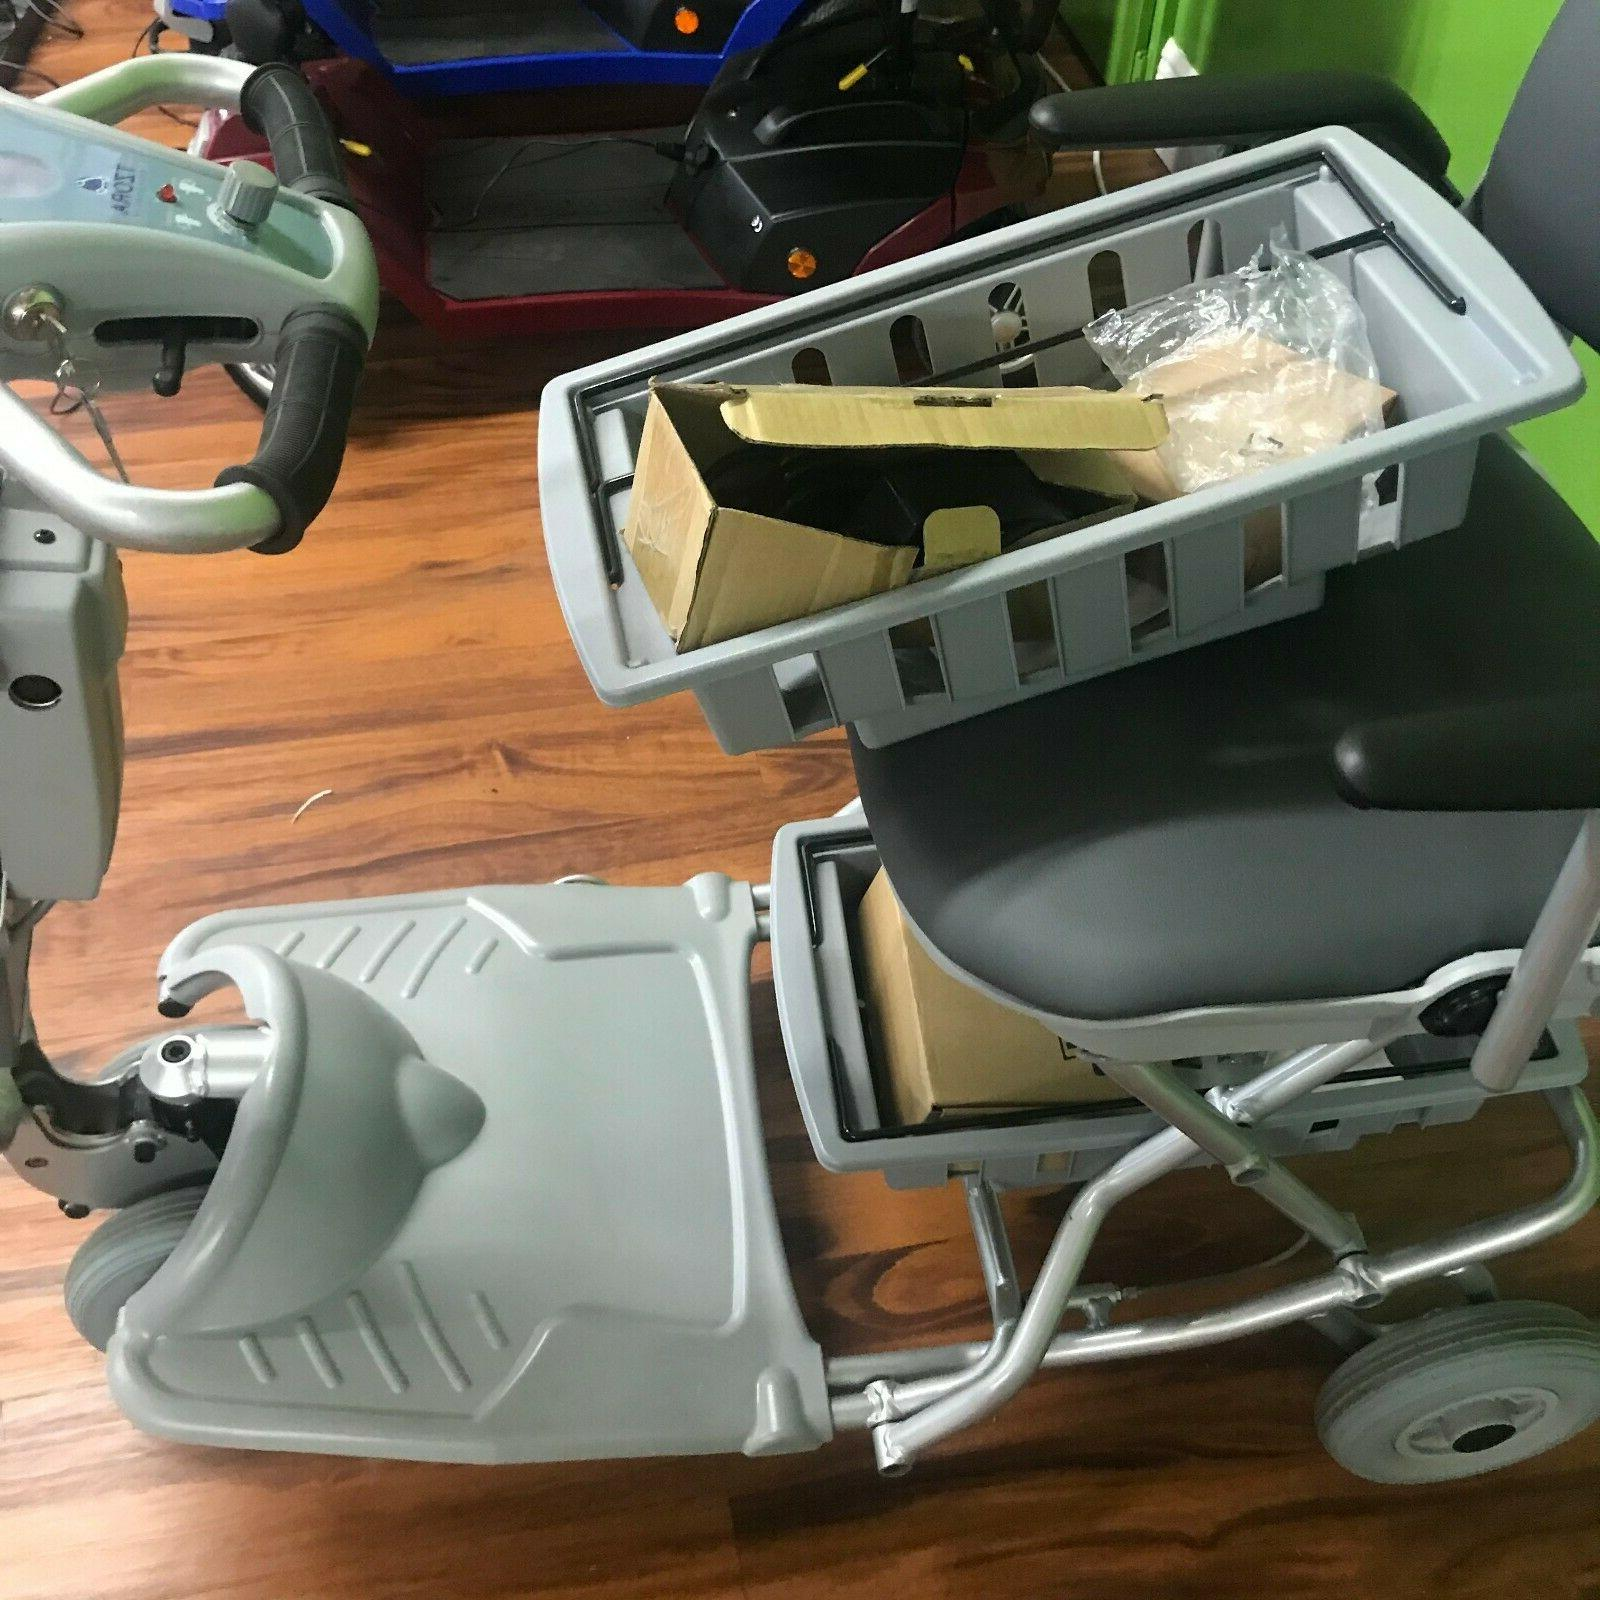 light folding travel folding mobility scooter used